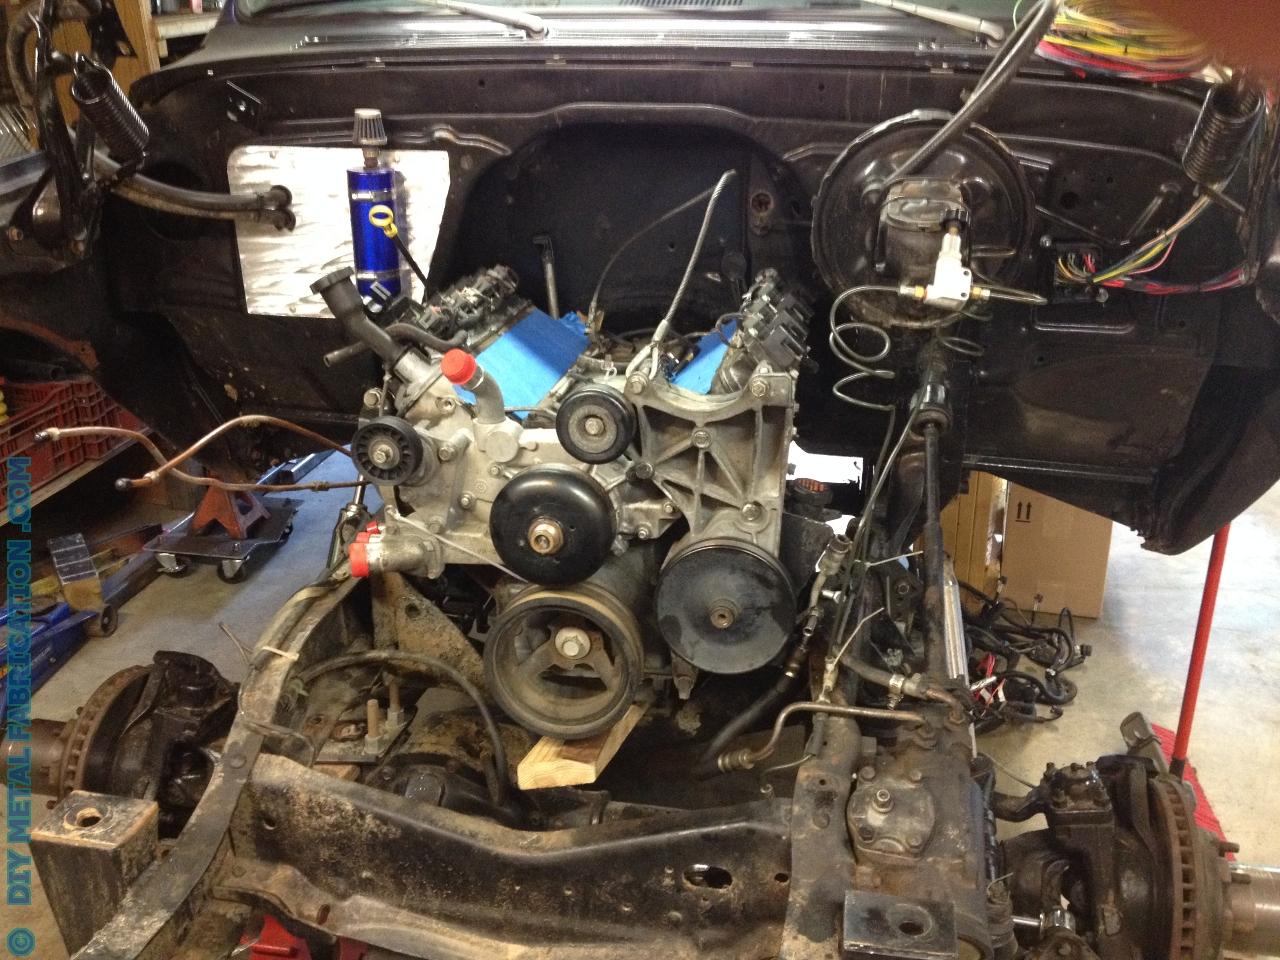 5 3 ls engine swap into ol u2019 blue 1971 chevy truck part 2